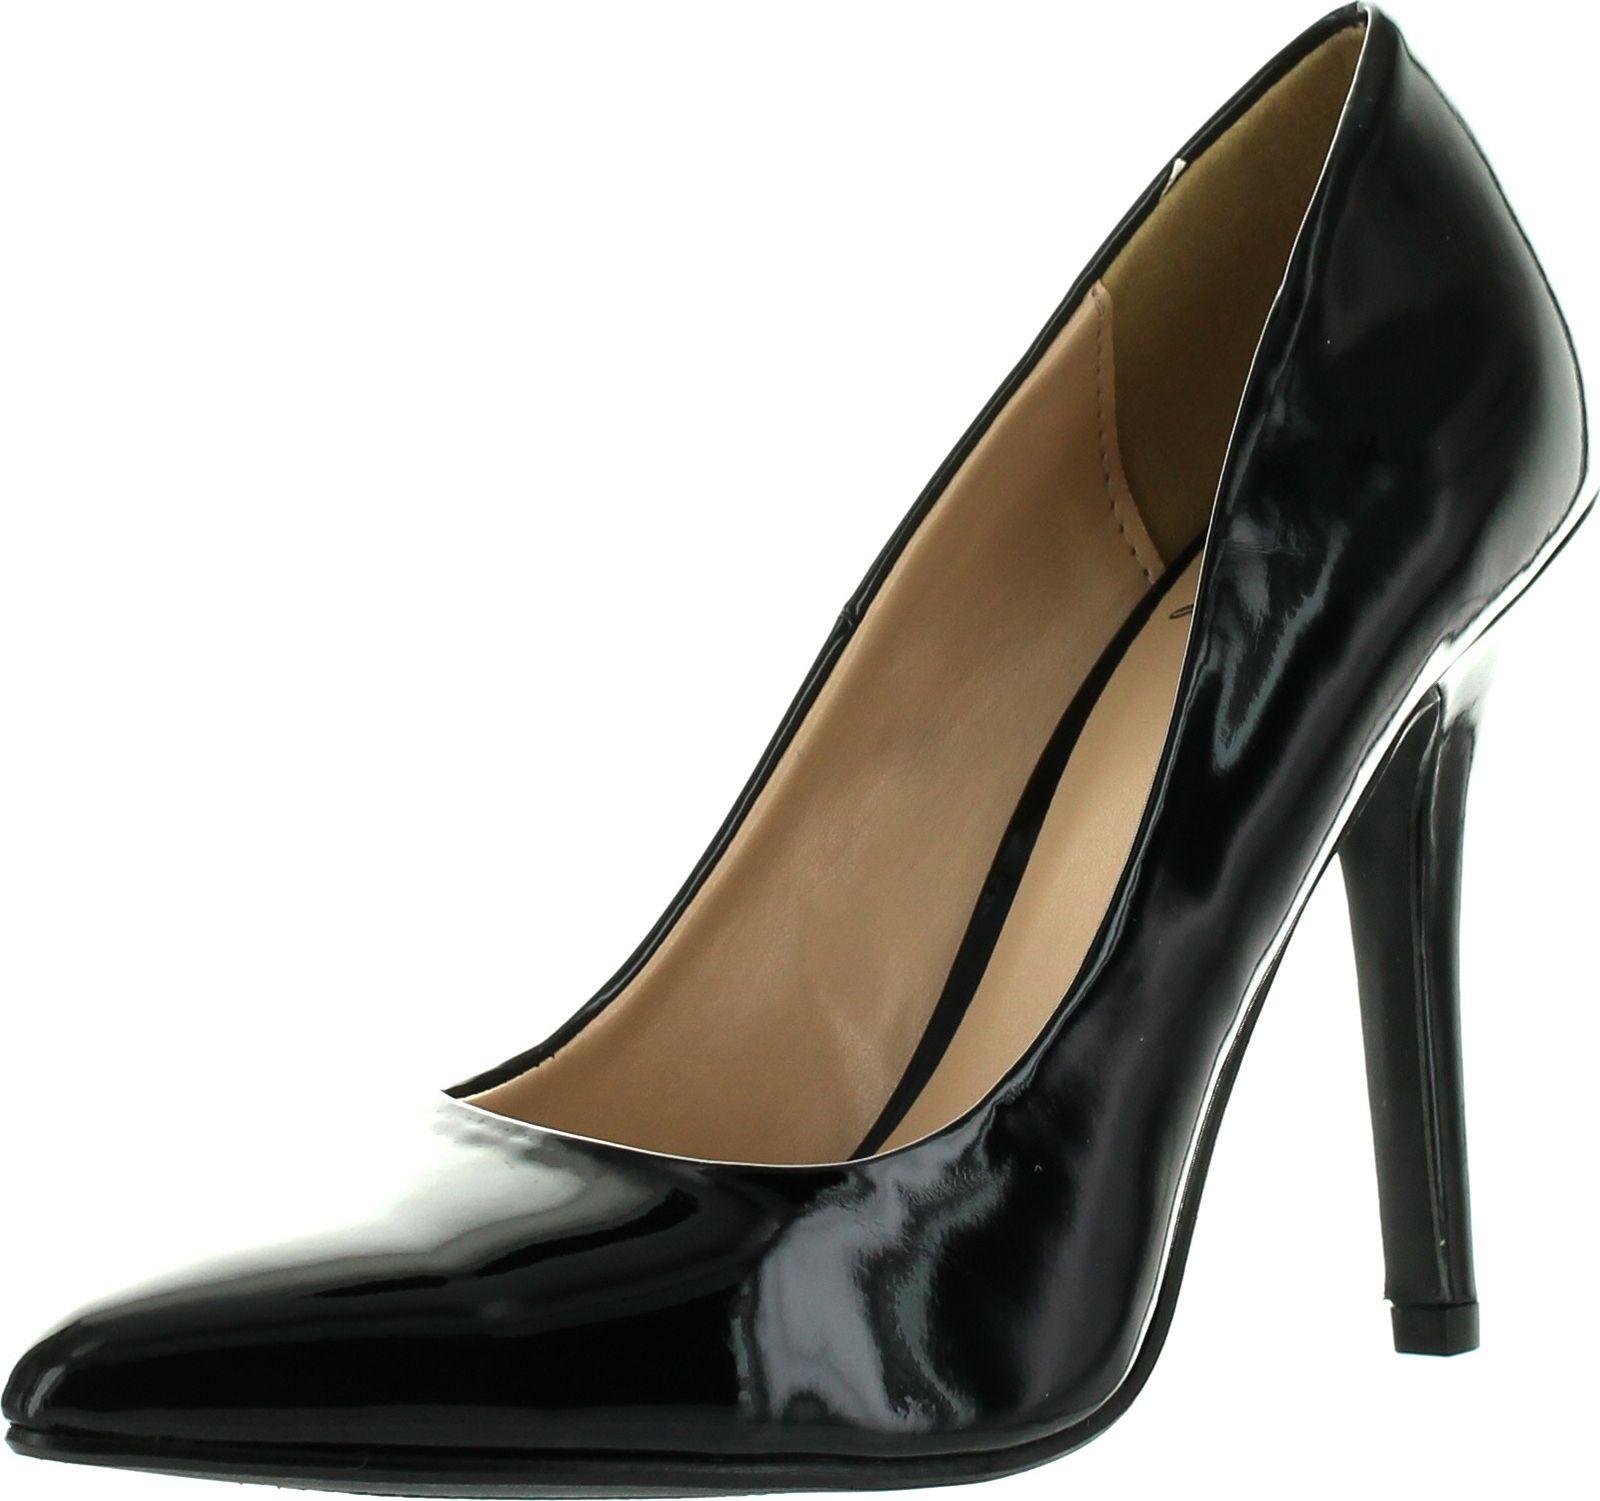 High heels dating